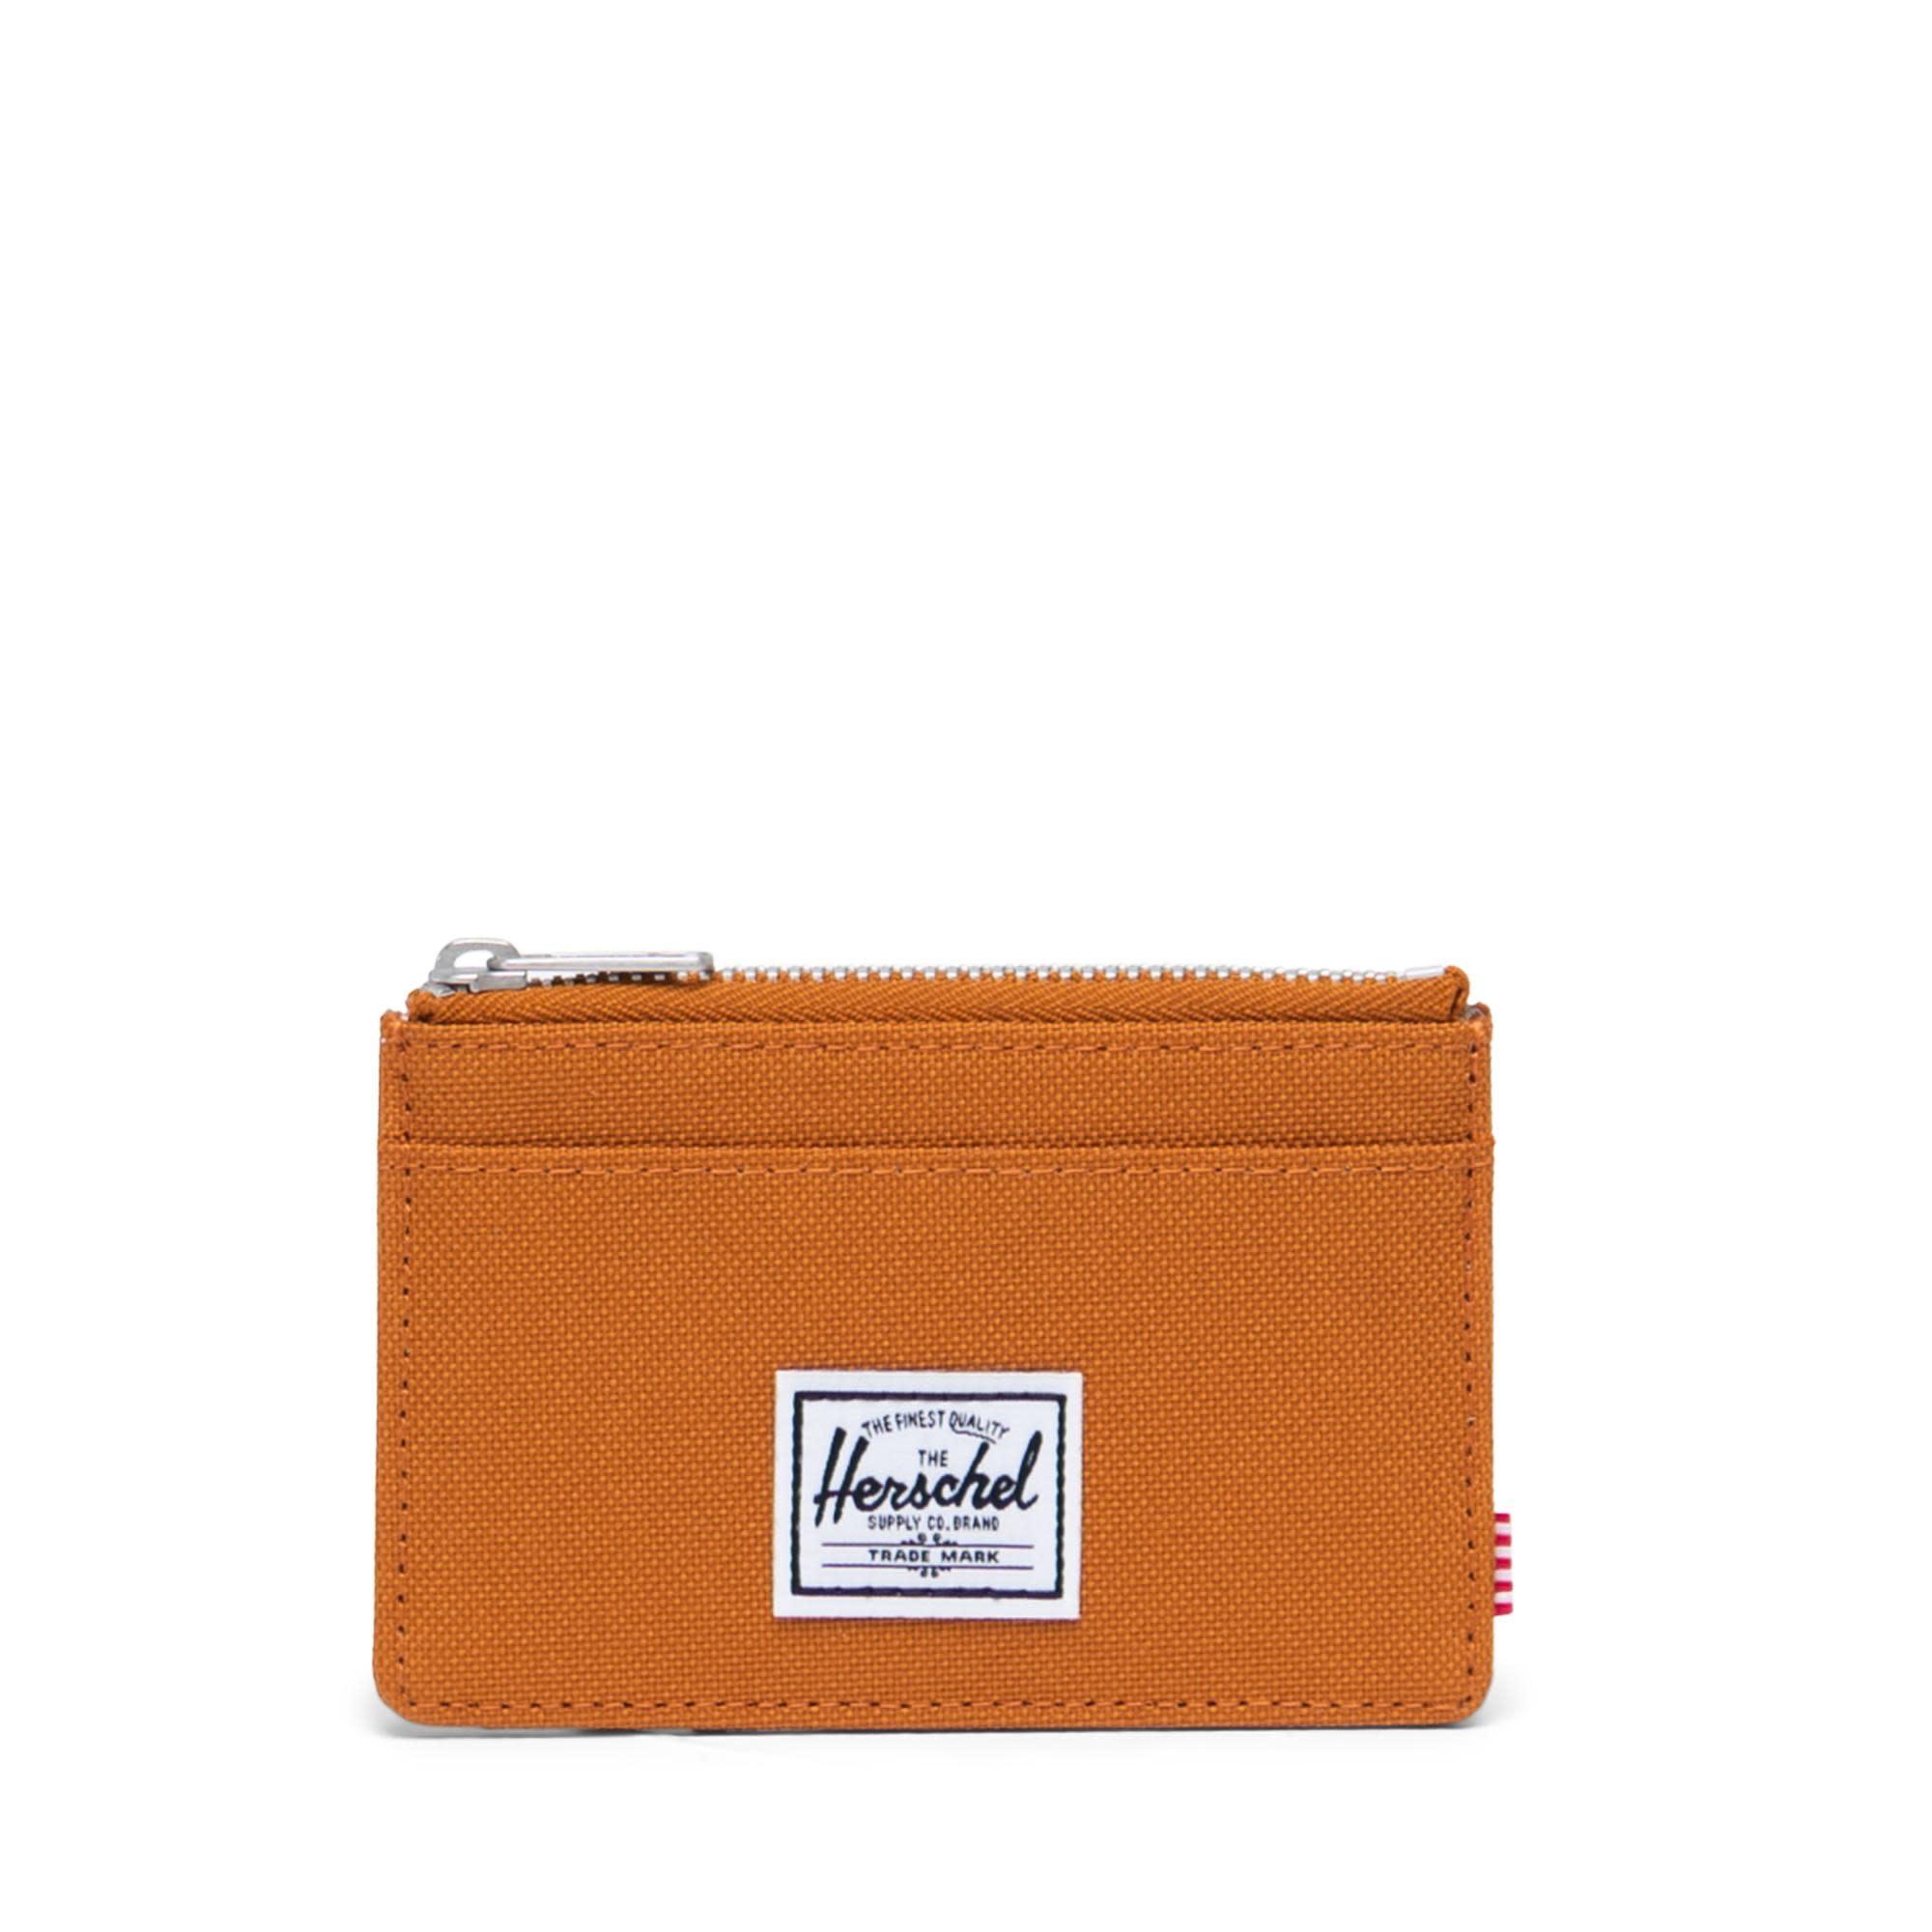 Herschel Supply Co. Herschel Oscar Wallet - Pumpkin Spice